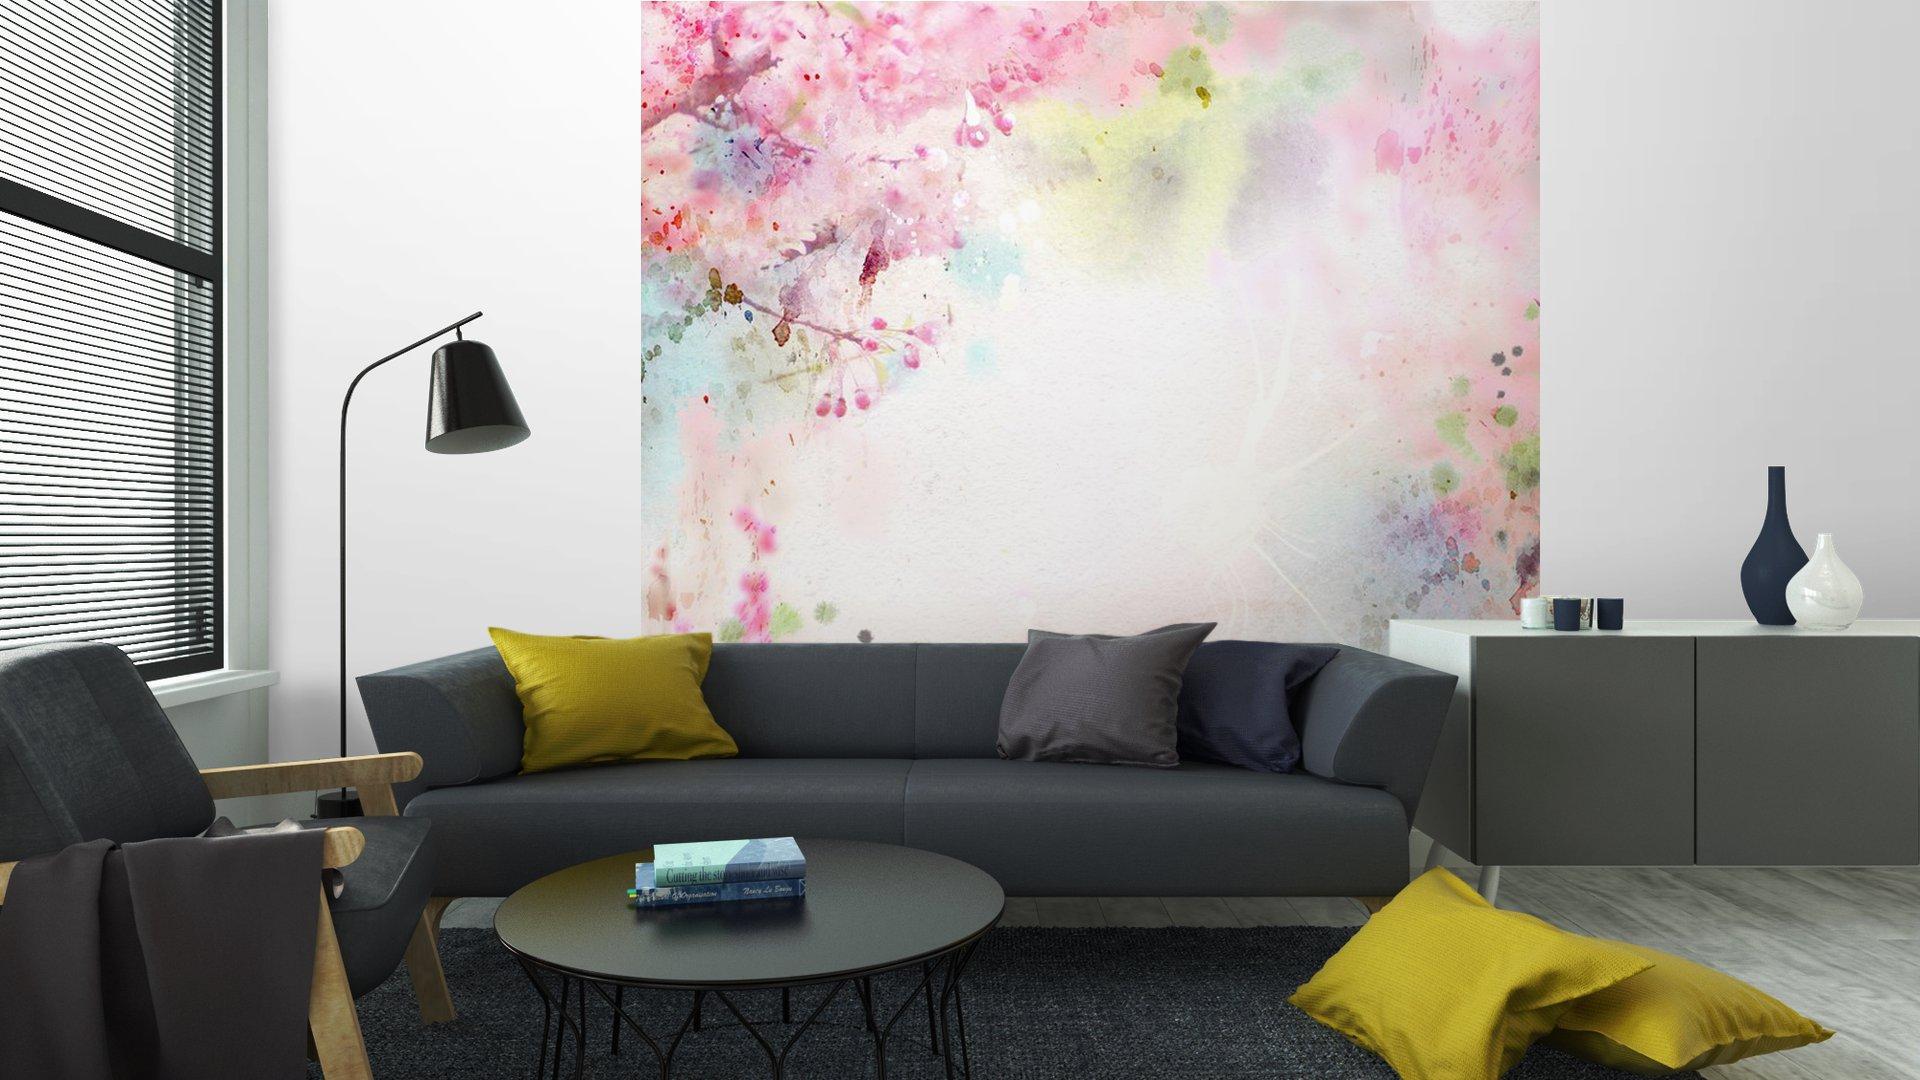 ACUARELA DE FONDO ESCÉNICO COMPOSICIÓN FLORAL SAKURA6 - Fotomural Tapiz Composición Floral Sakura Tipo Acuarela